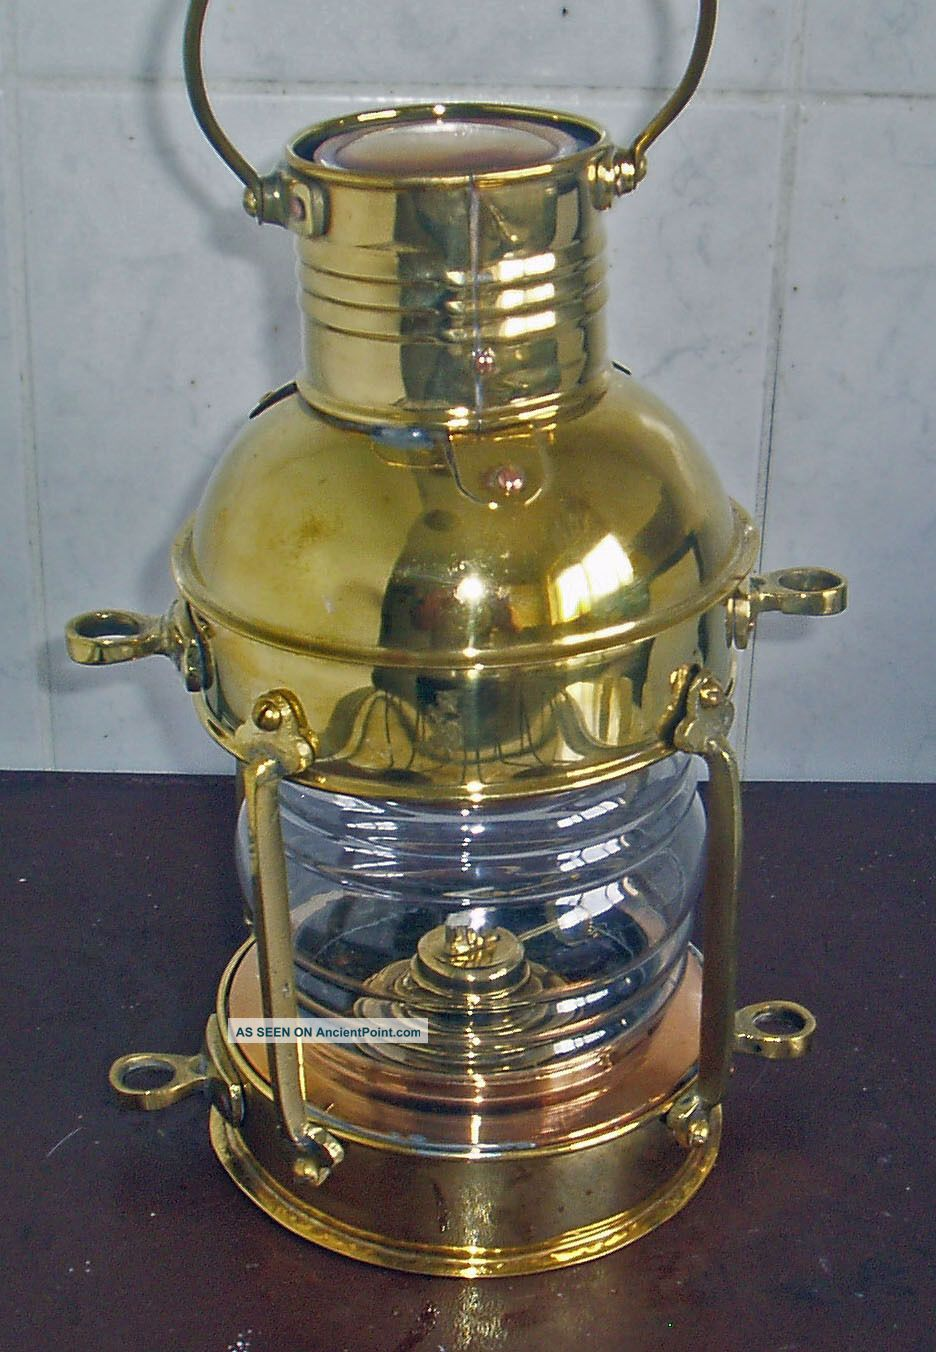 Maritime Brass Ships Kerosene Lantern Lamp Height 30 Cm Or 12 Inch Other Maritime photo